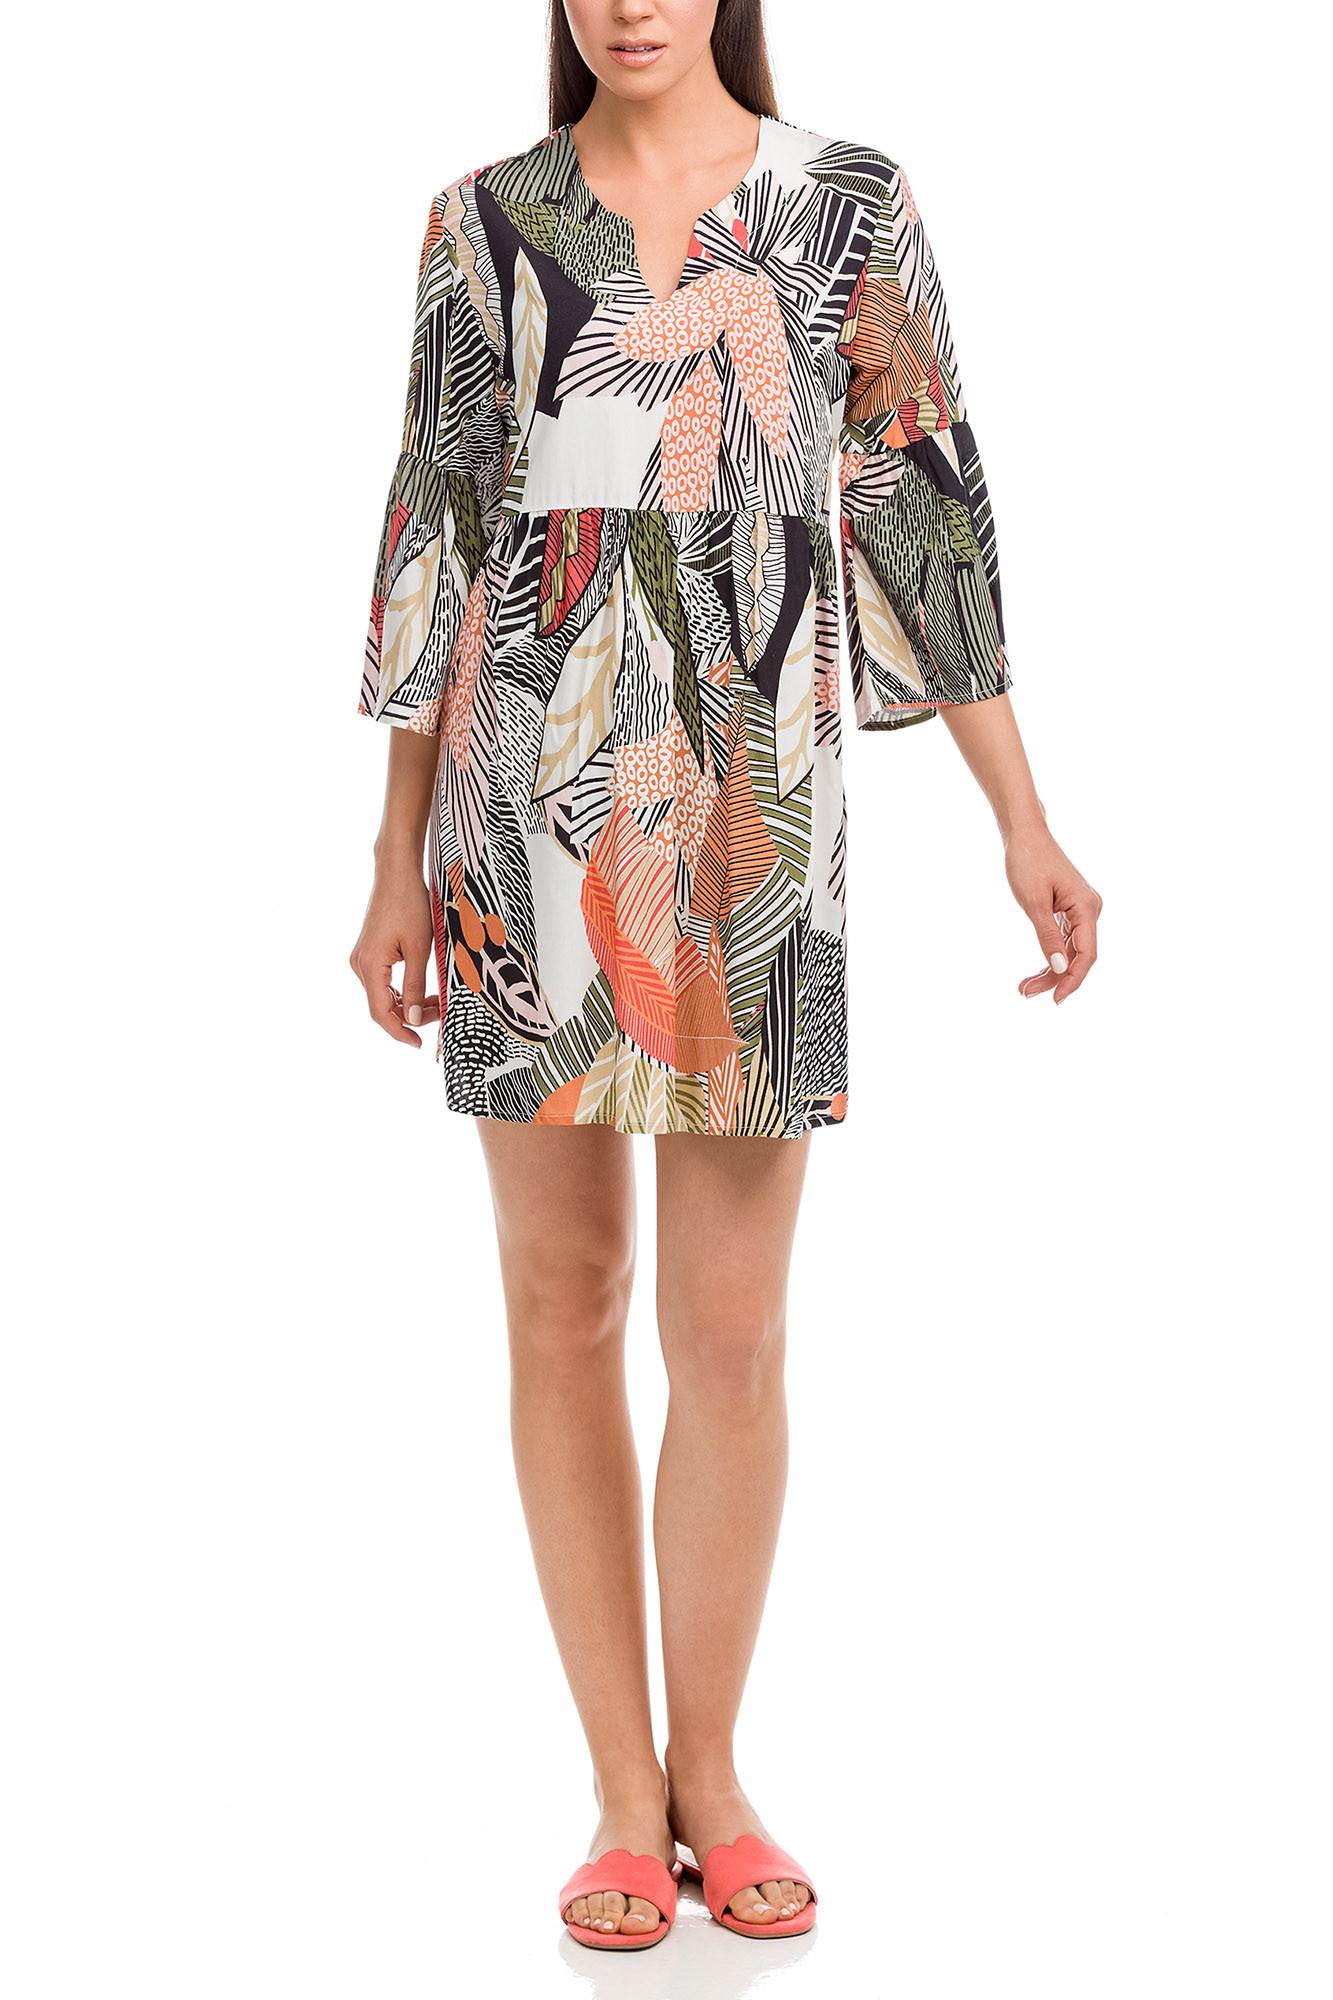 Vamp - Dámske šaty 12530 - Vamp coral spark m